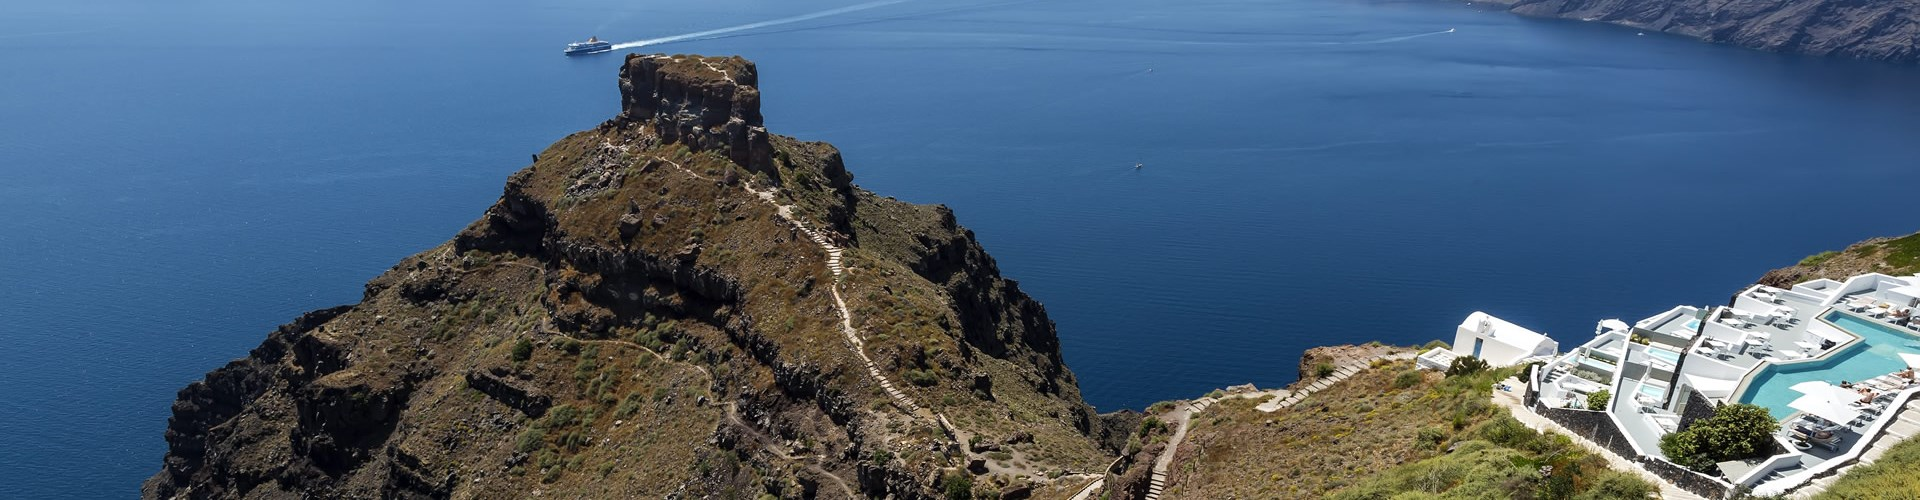 The castle of Skaros - Castles - Santorini